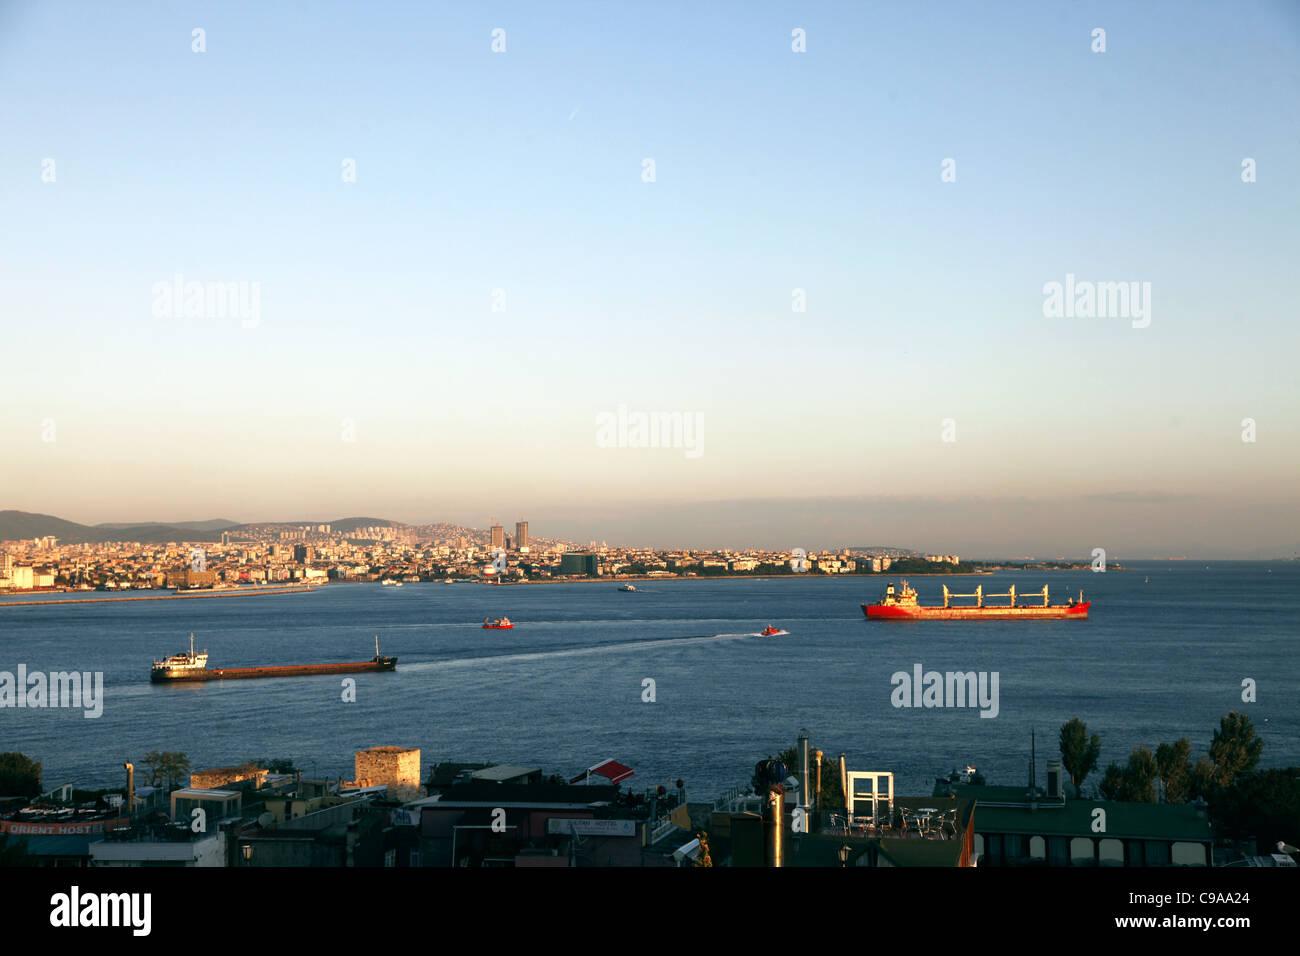 RED OIL TANKERS ON BOSPHORUS TAKSIM ISTANBUL TURKEY 03 October 2011 Stock Photo